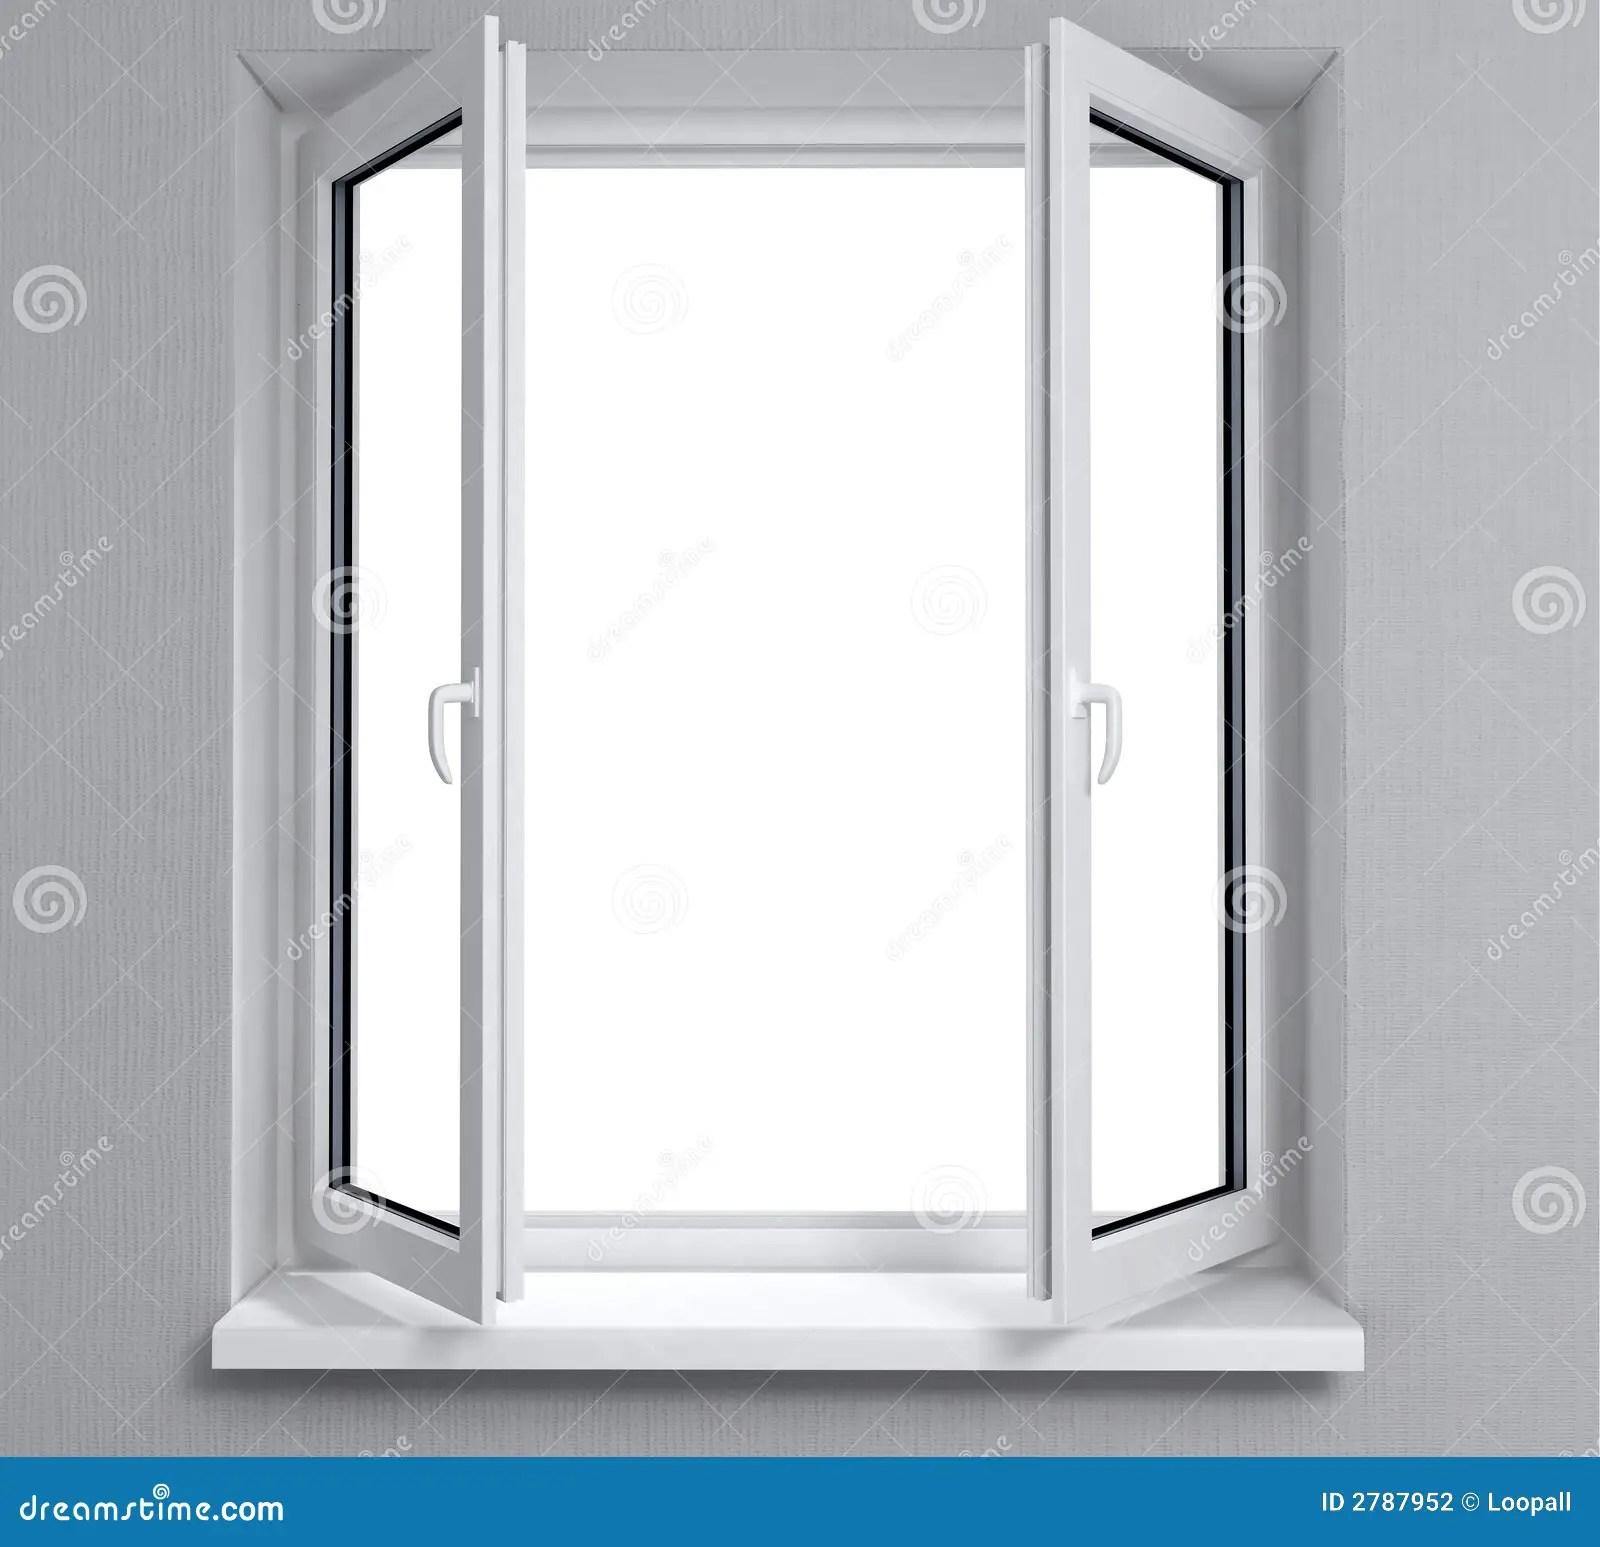 Wallpaper Brick 3d Opened Window Stock Photography Image 2787952